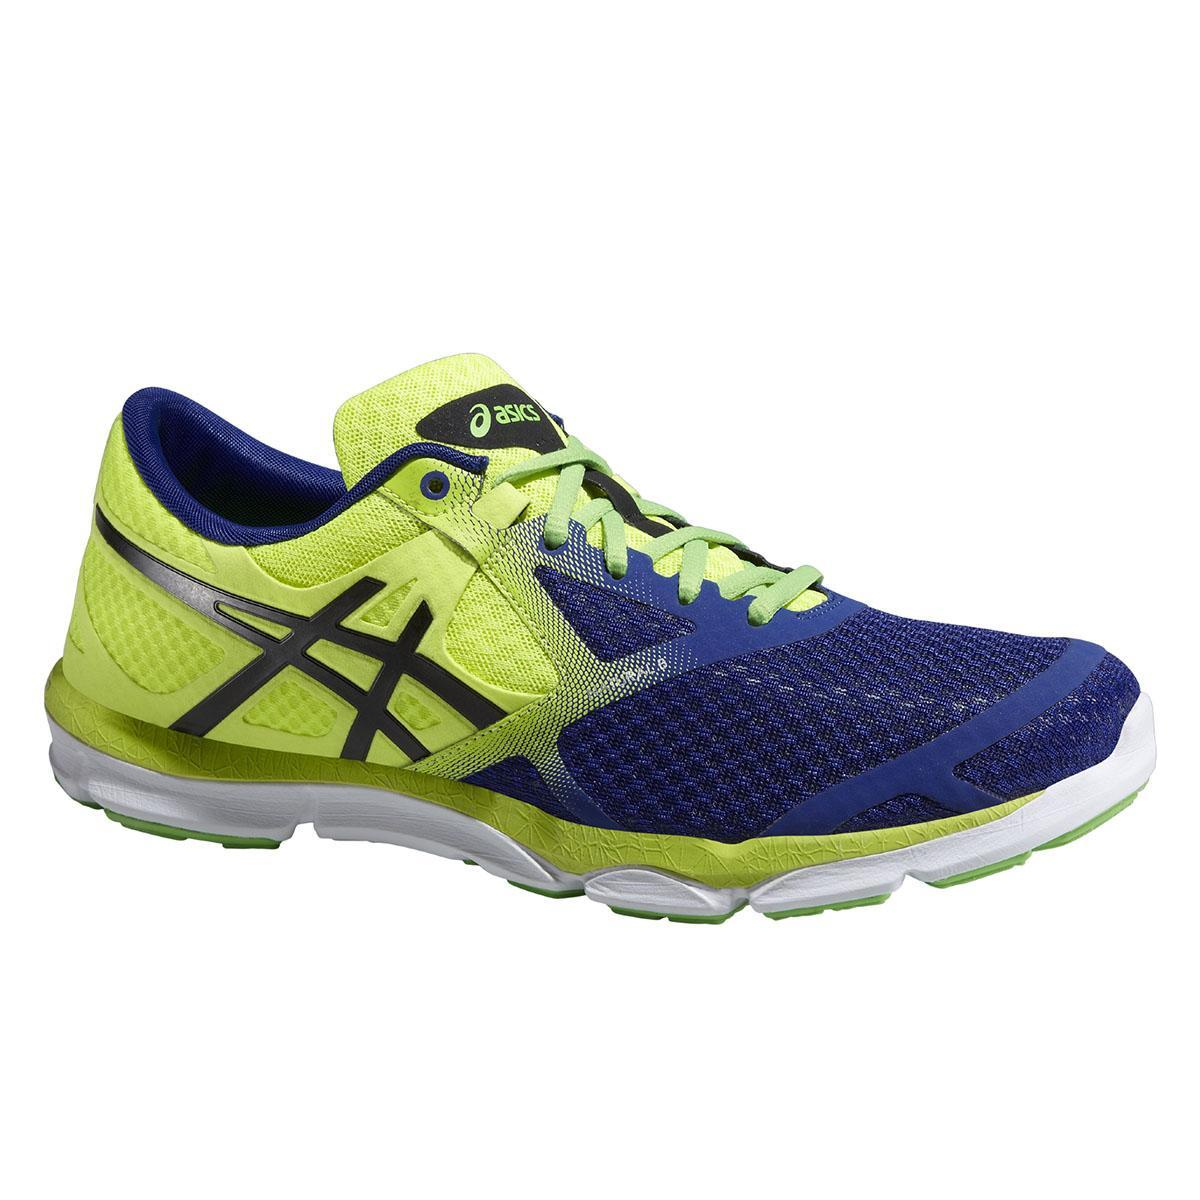 4edc1571e6397 Asics Mens 33-DFA Running Shoes - Deep Blue/Onyx/Flash Yellow -  Tennisnuts.com